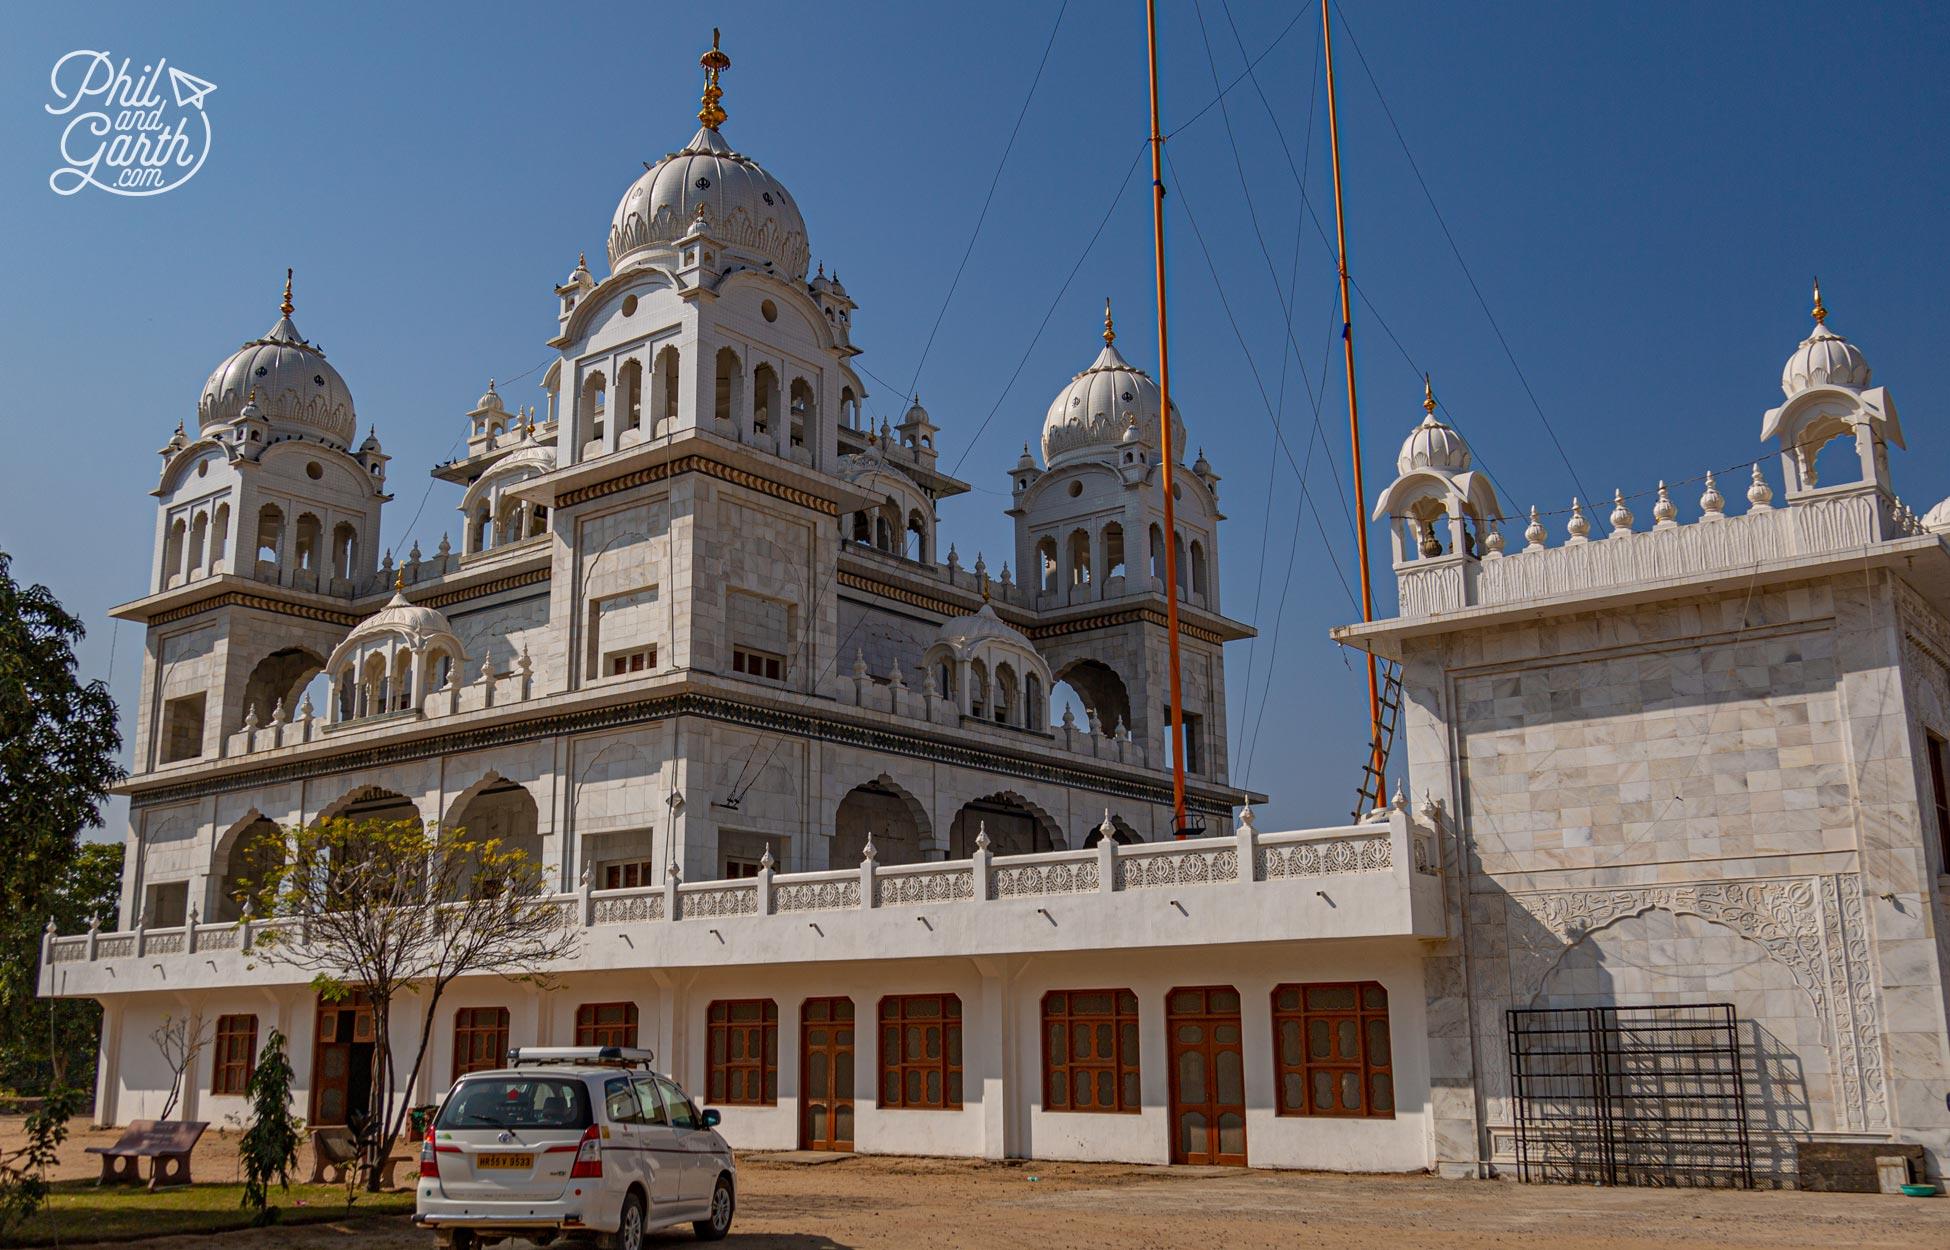 The Gurudwara Singh Sabha, a grand Sikh temple